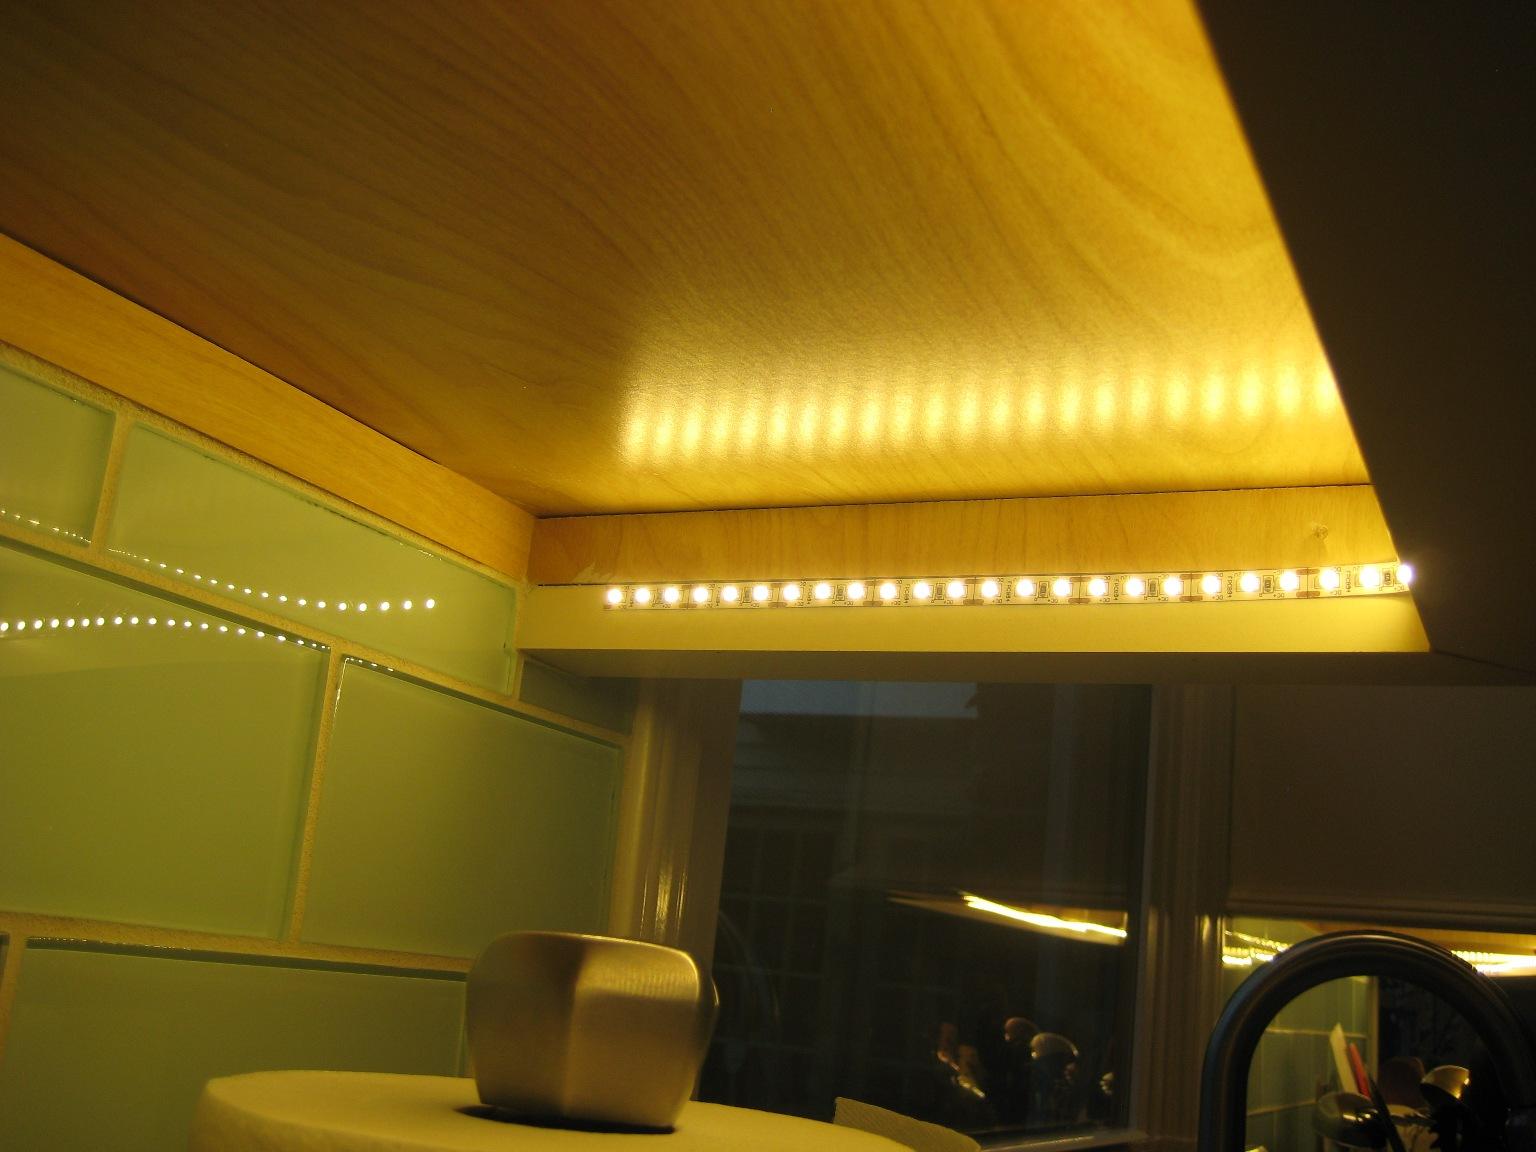 kitchen under cabinet lighting anyone added 2 kitchen cabinet lighting img Kitchen under cabinet lighting anyone added